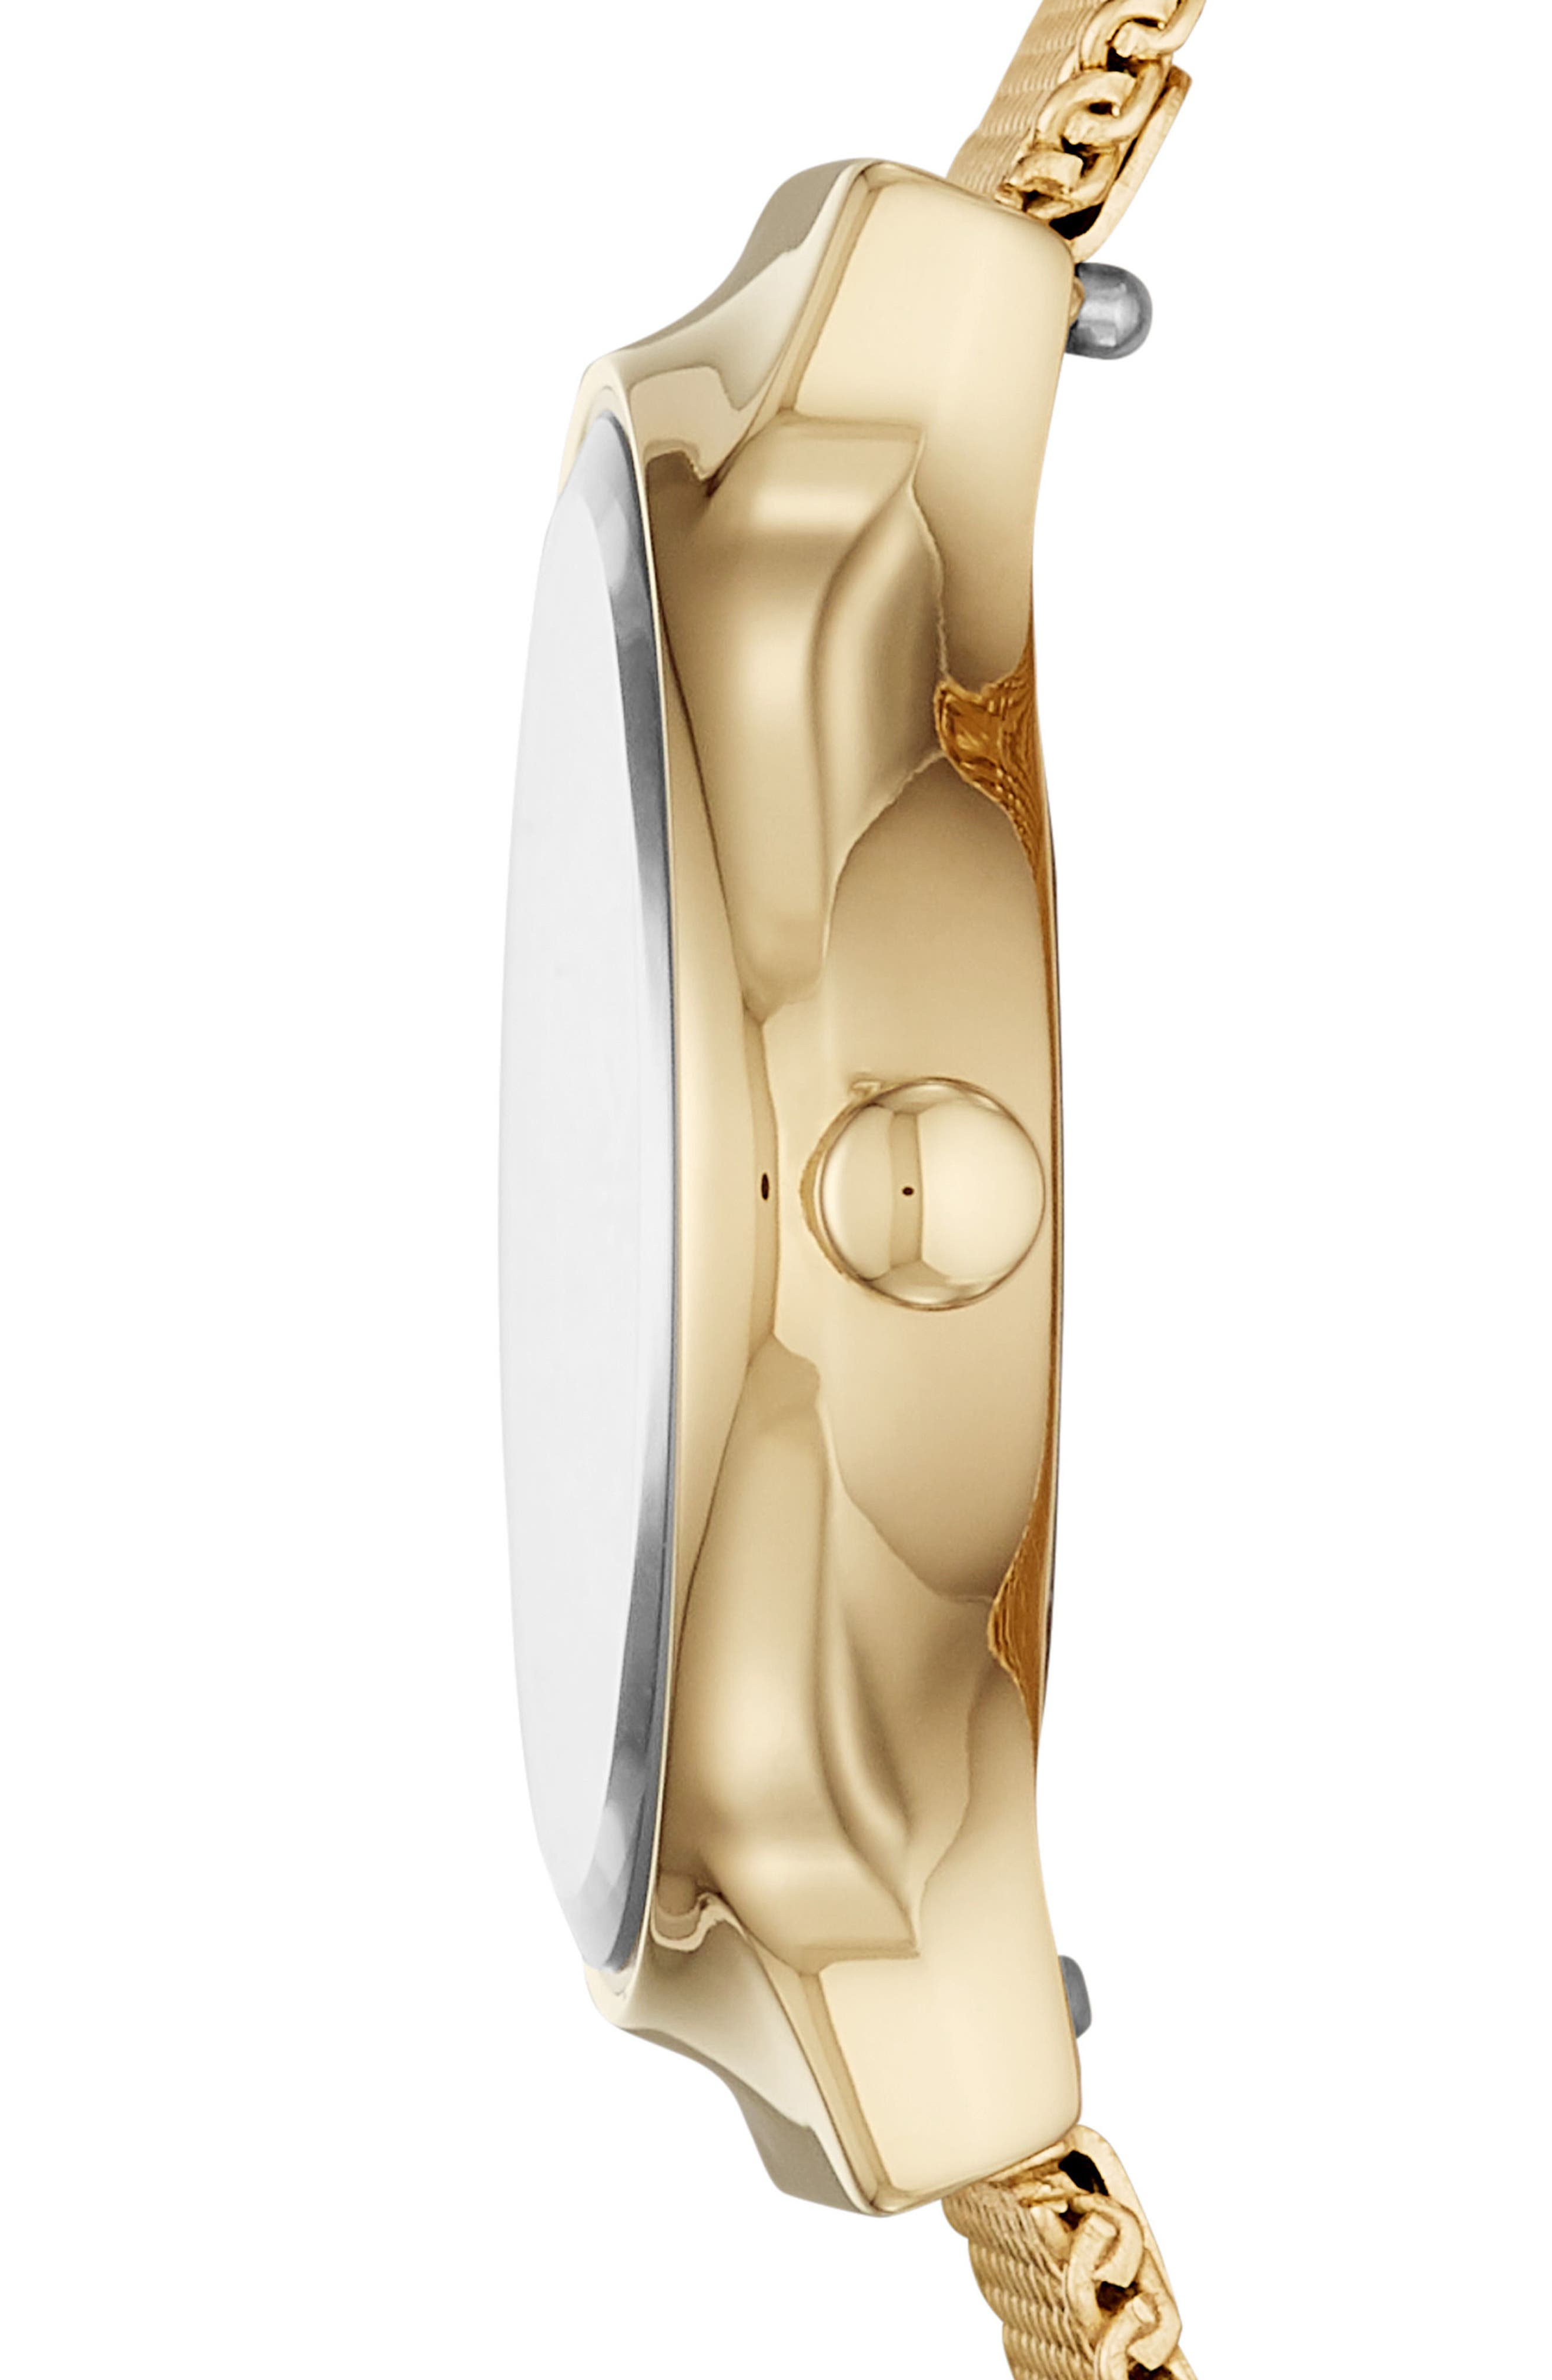 SKAGEN, Freja Bracelet Watch, 26mm, Alternate thumbnail 2, color, GOLD/ SILVER/ GOLD